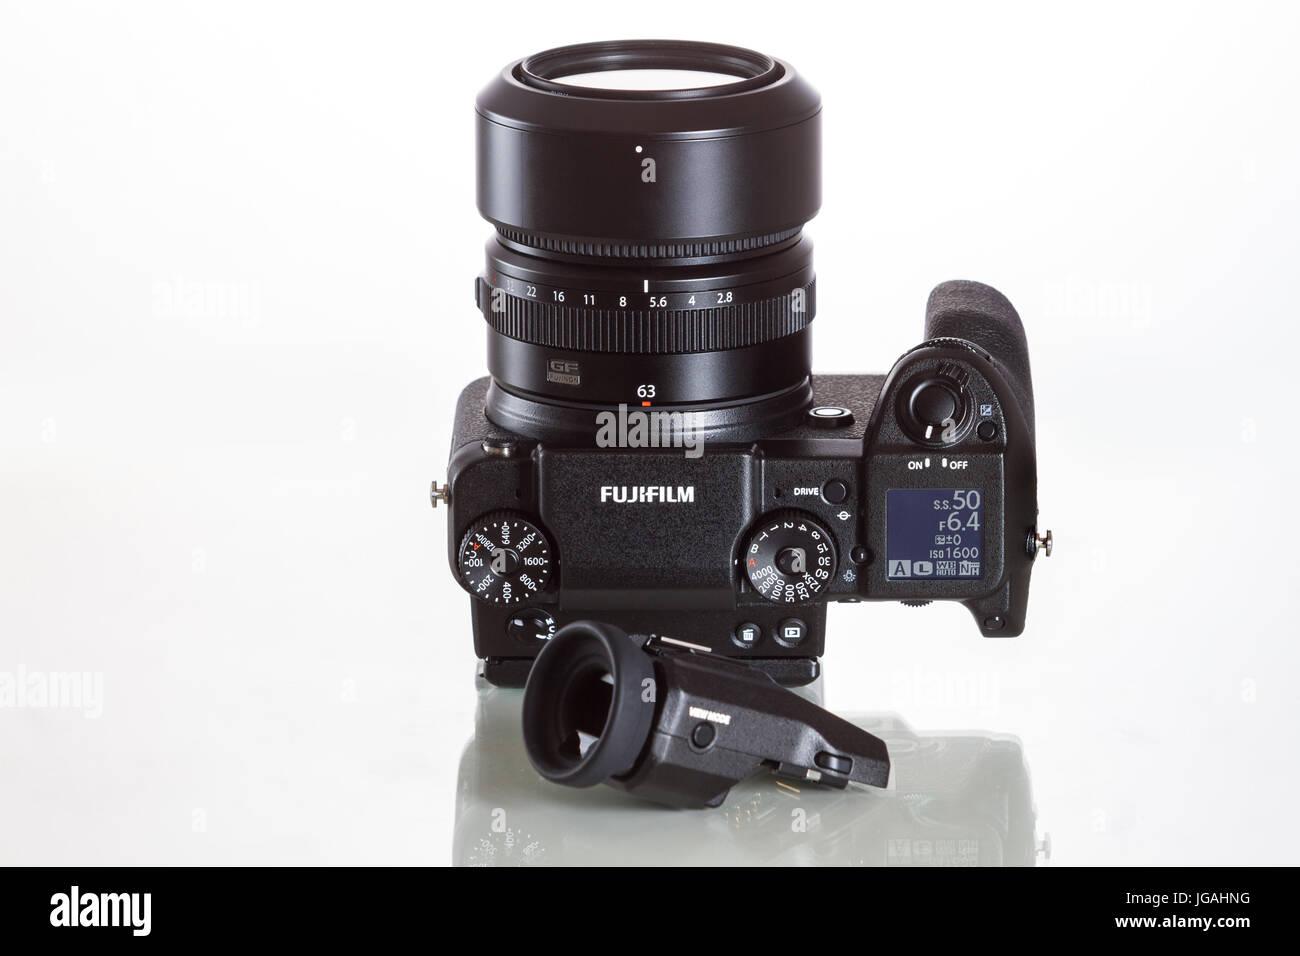 Fujifilm GFX 50S, 51 megapixels, medium format sensor digital camera with additional electronic viewfinder 3.69M - Stock Image